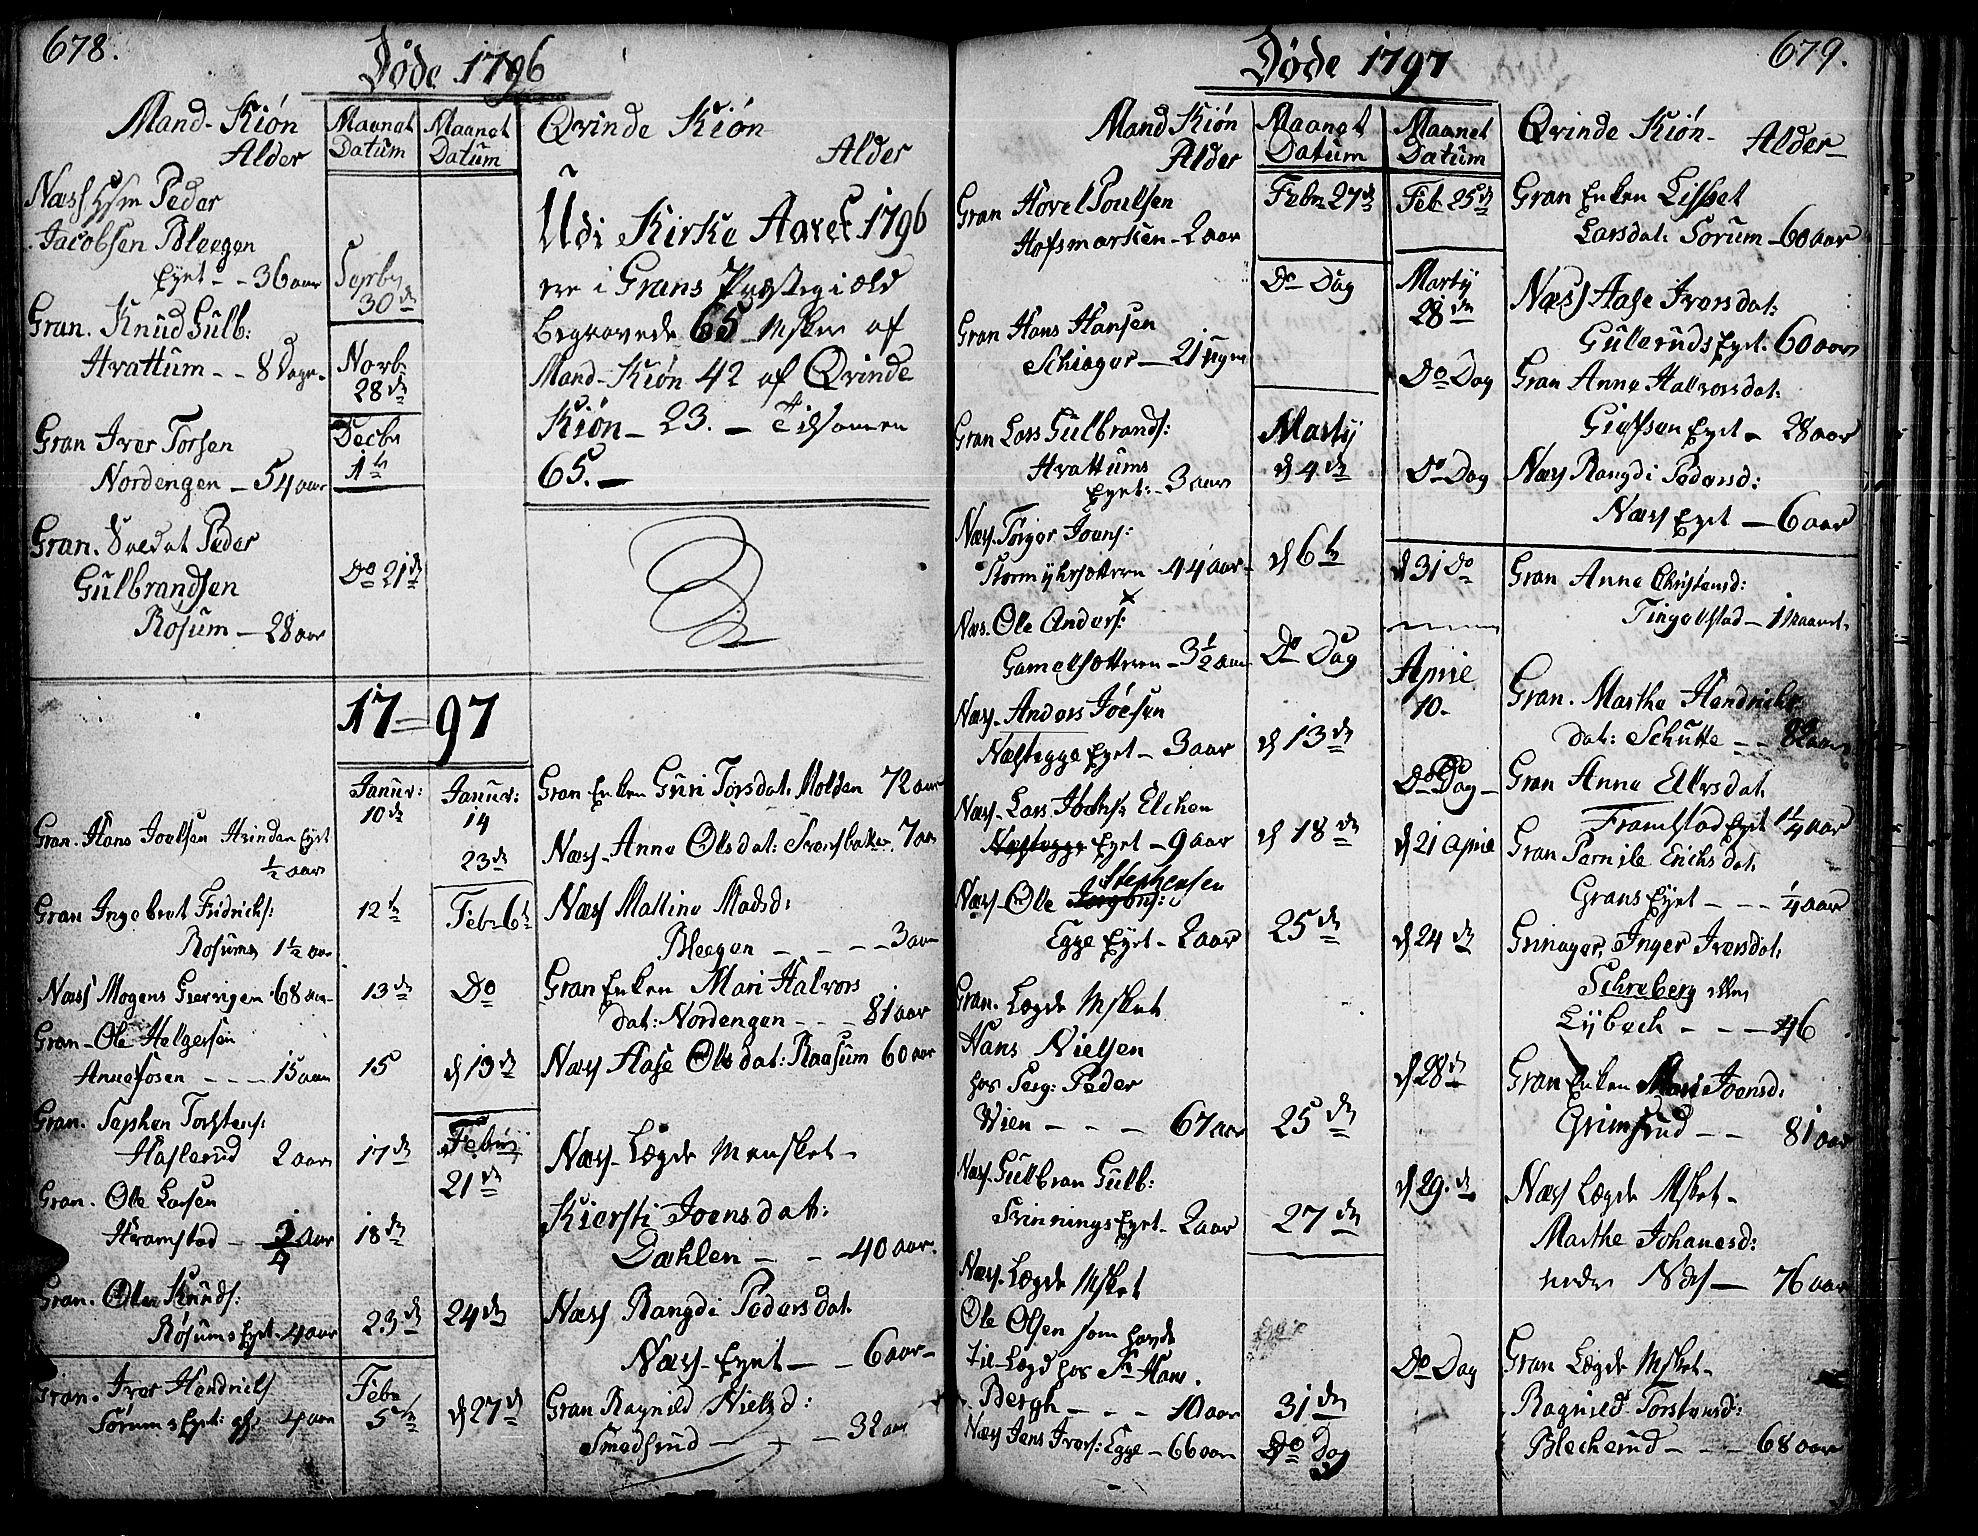 SAH, Gran prestekontor, Ministerialbok nr. 6, 1787-1824, s. 678-679